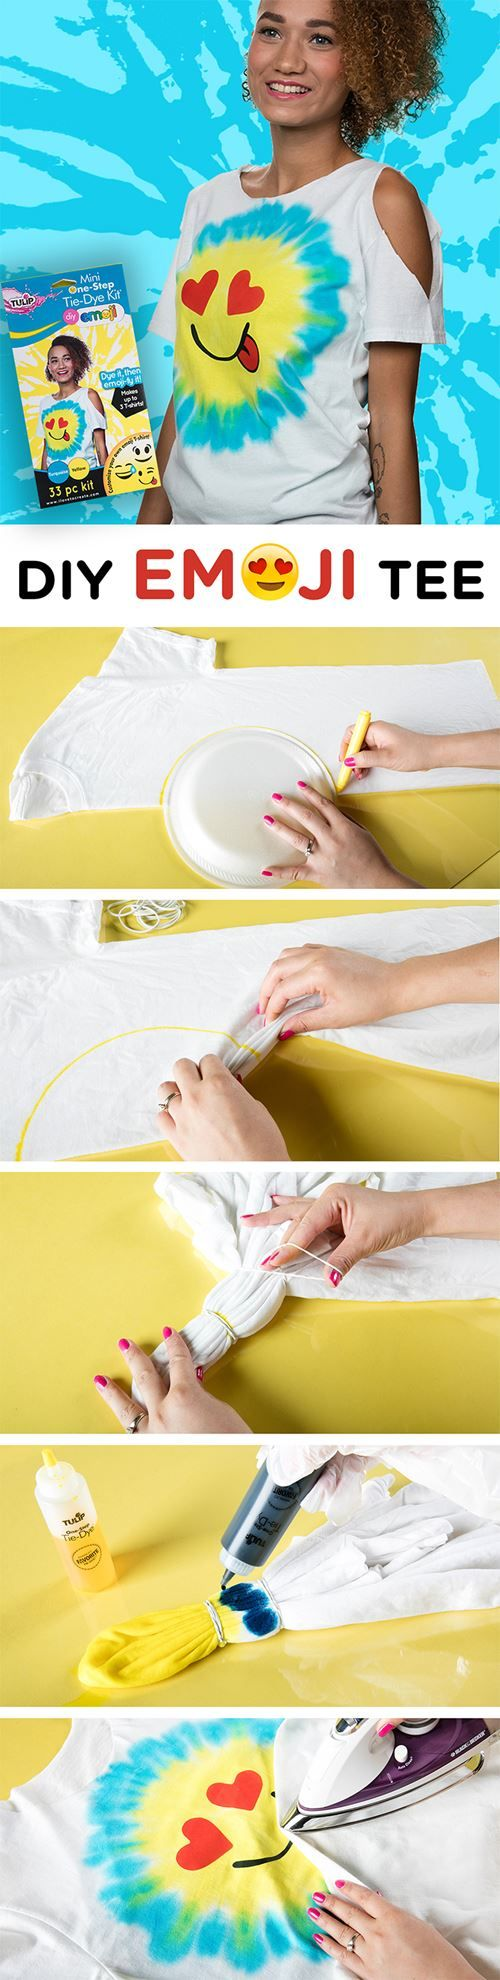 DIY Emoji t-shirt with Tulip One-Step Tie Dye